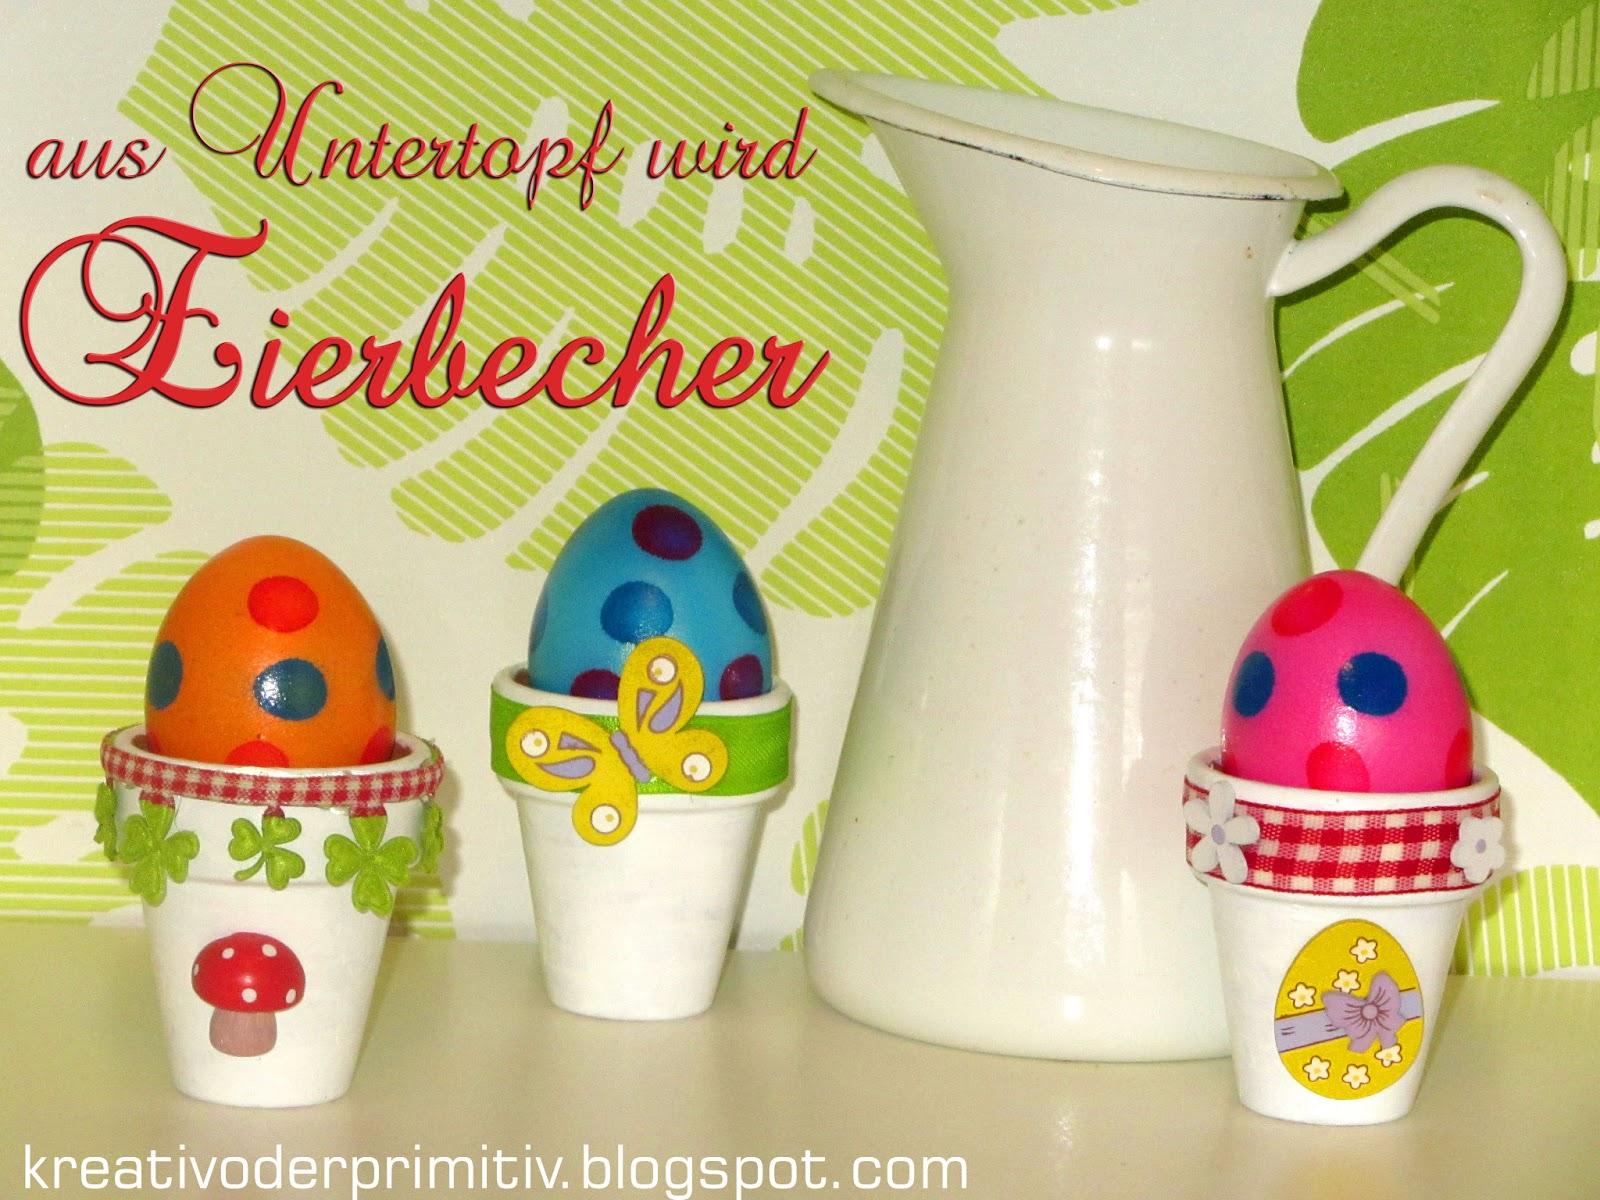 Kreativ oder primitiv aus untertopf wird eierbecher - Eierbecher selber basteln ...